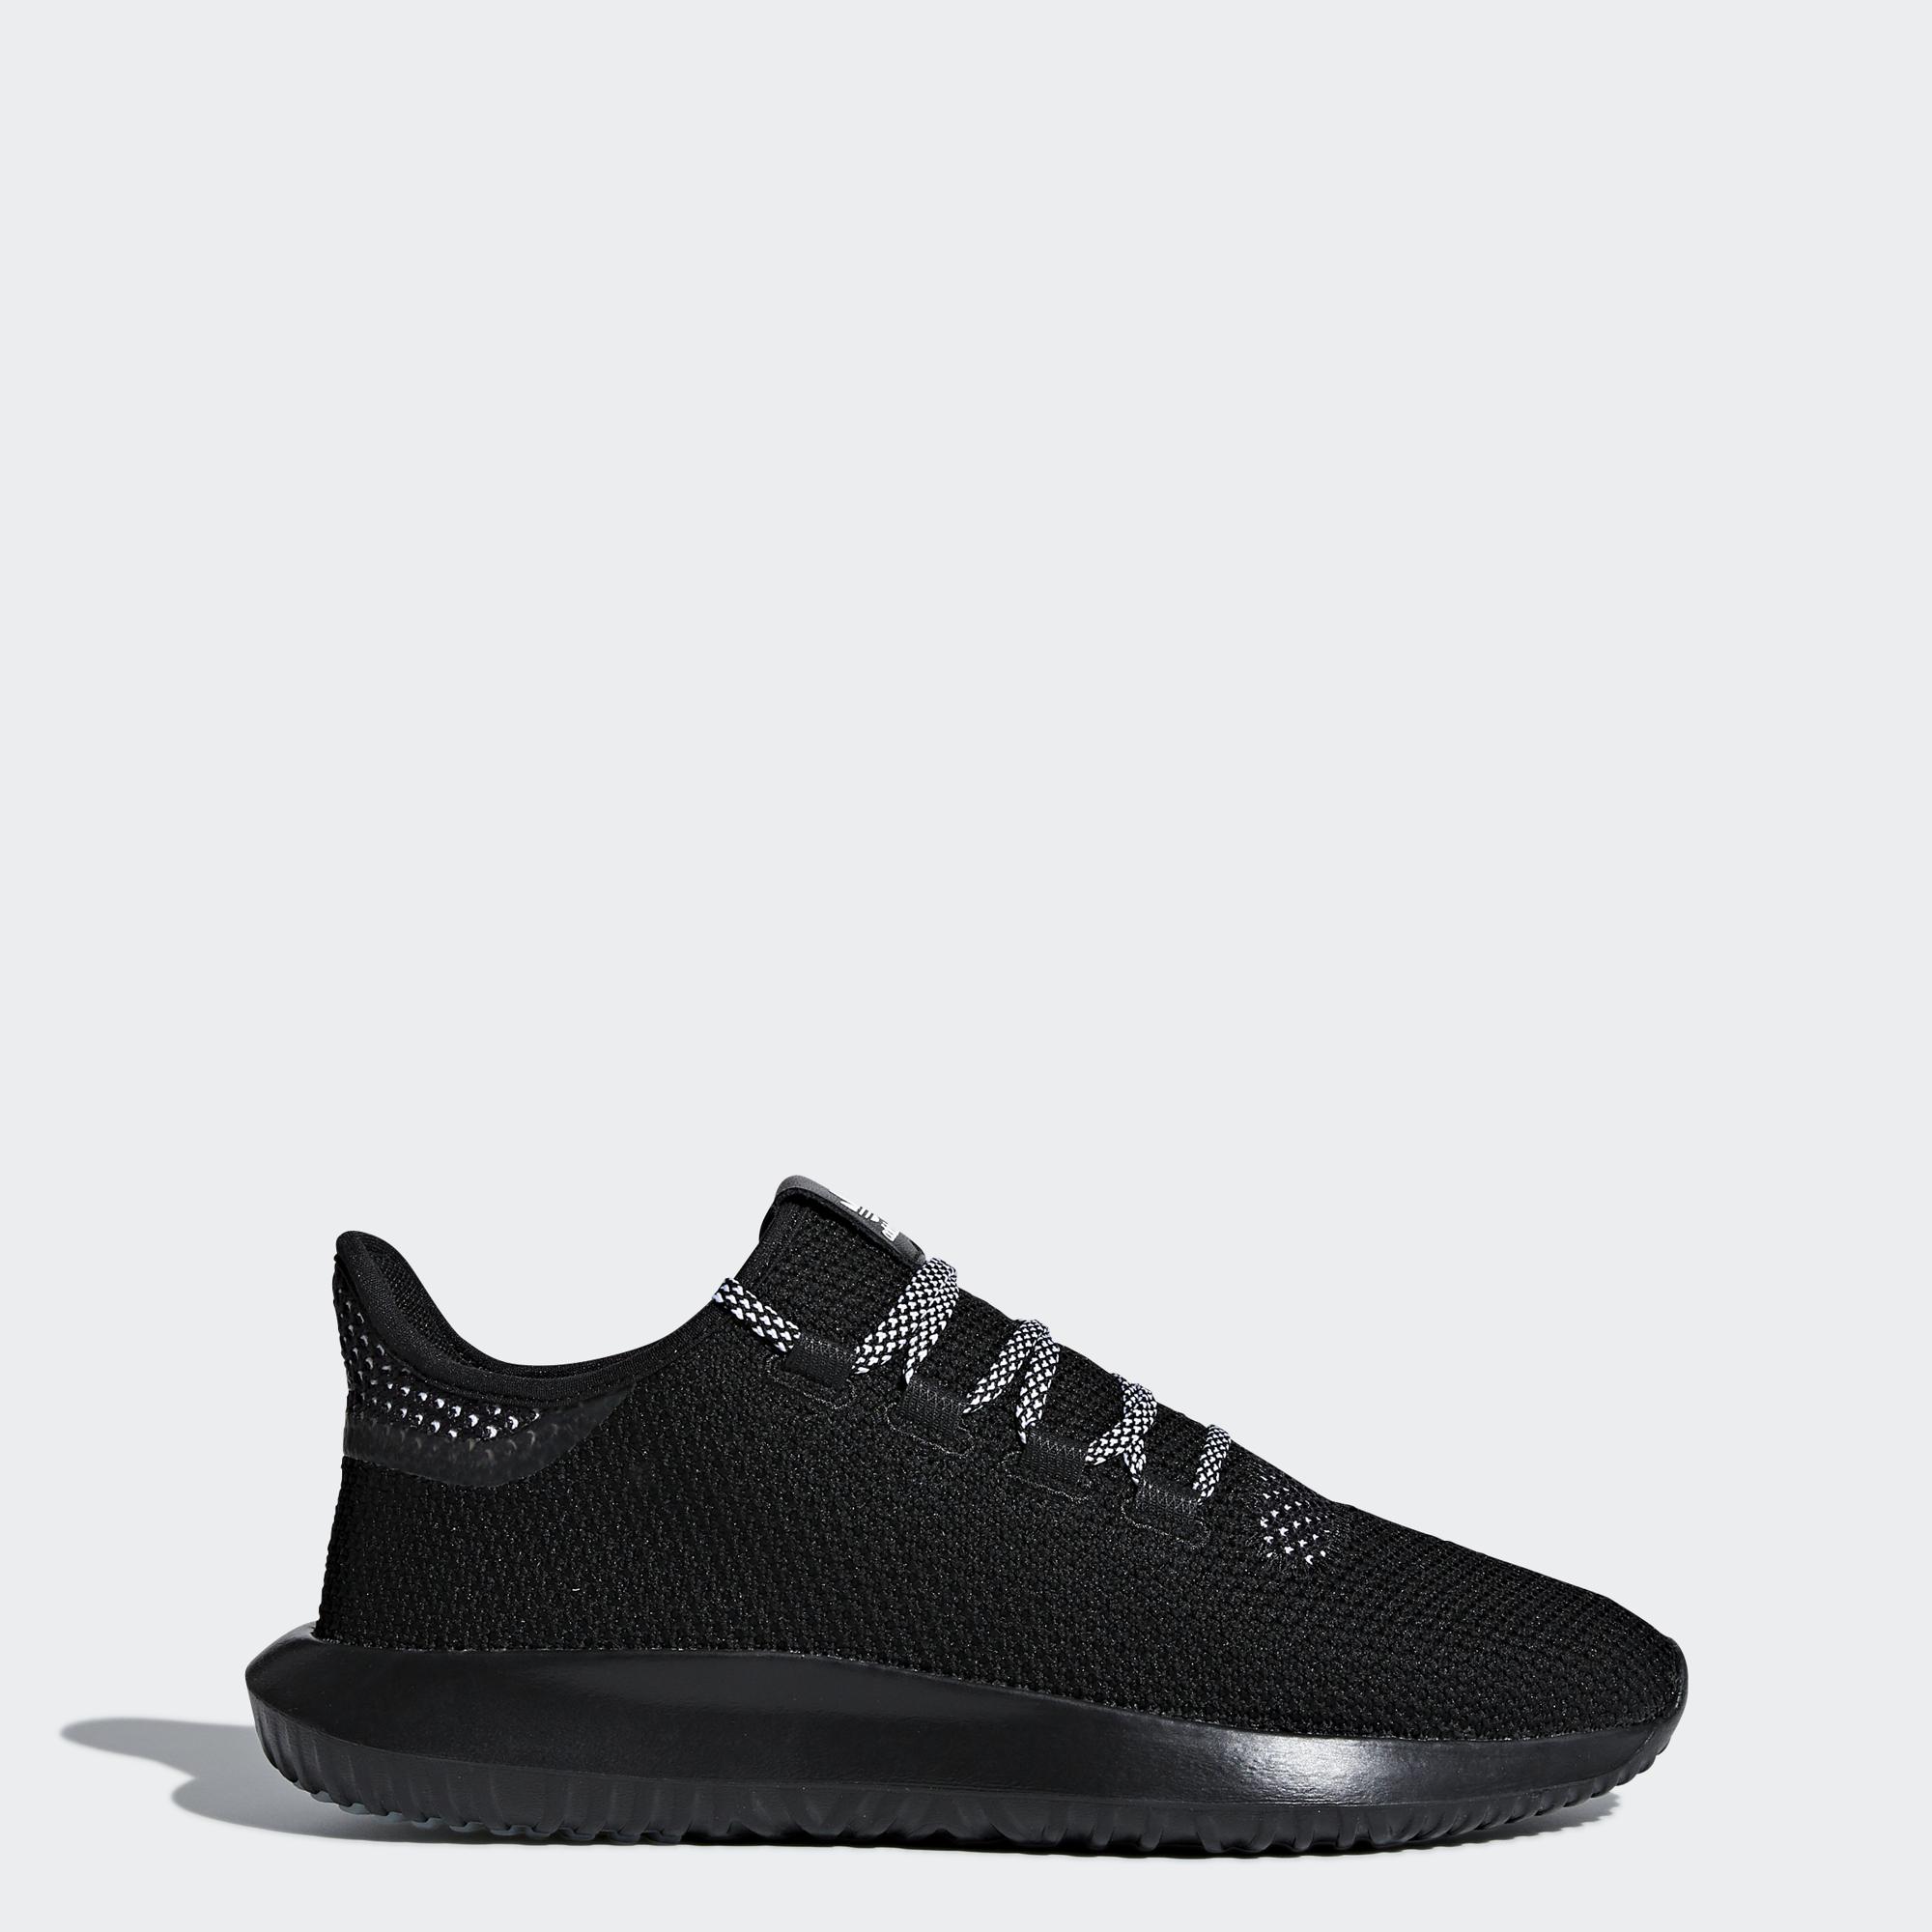 Pánske tenisky Adidas Originals Tubular Shadow CK CQ0930 - Teniskovo ... d2f1f78315b